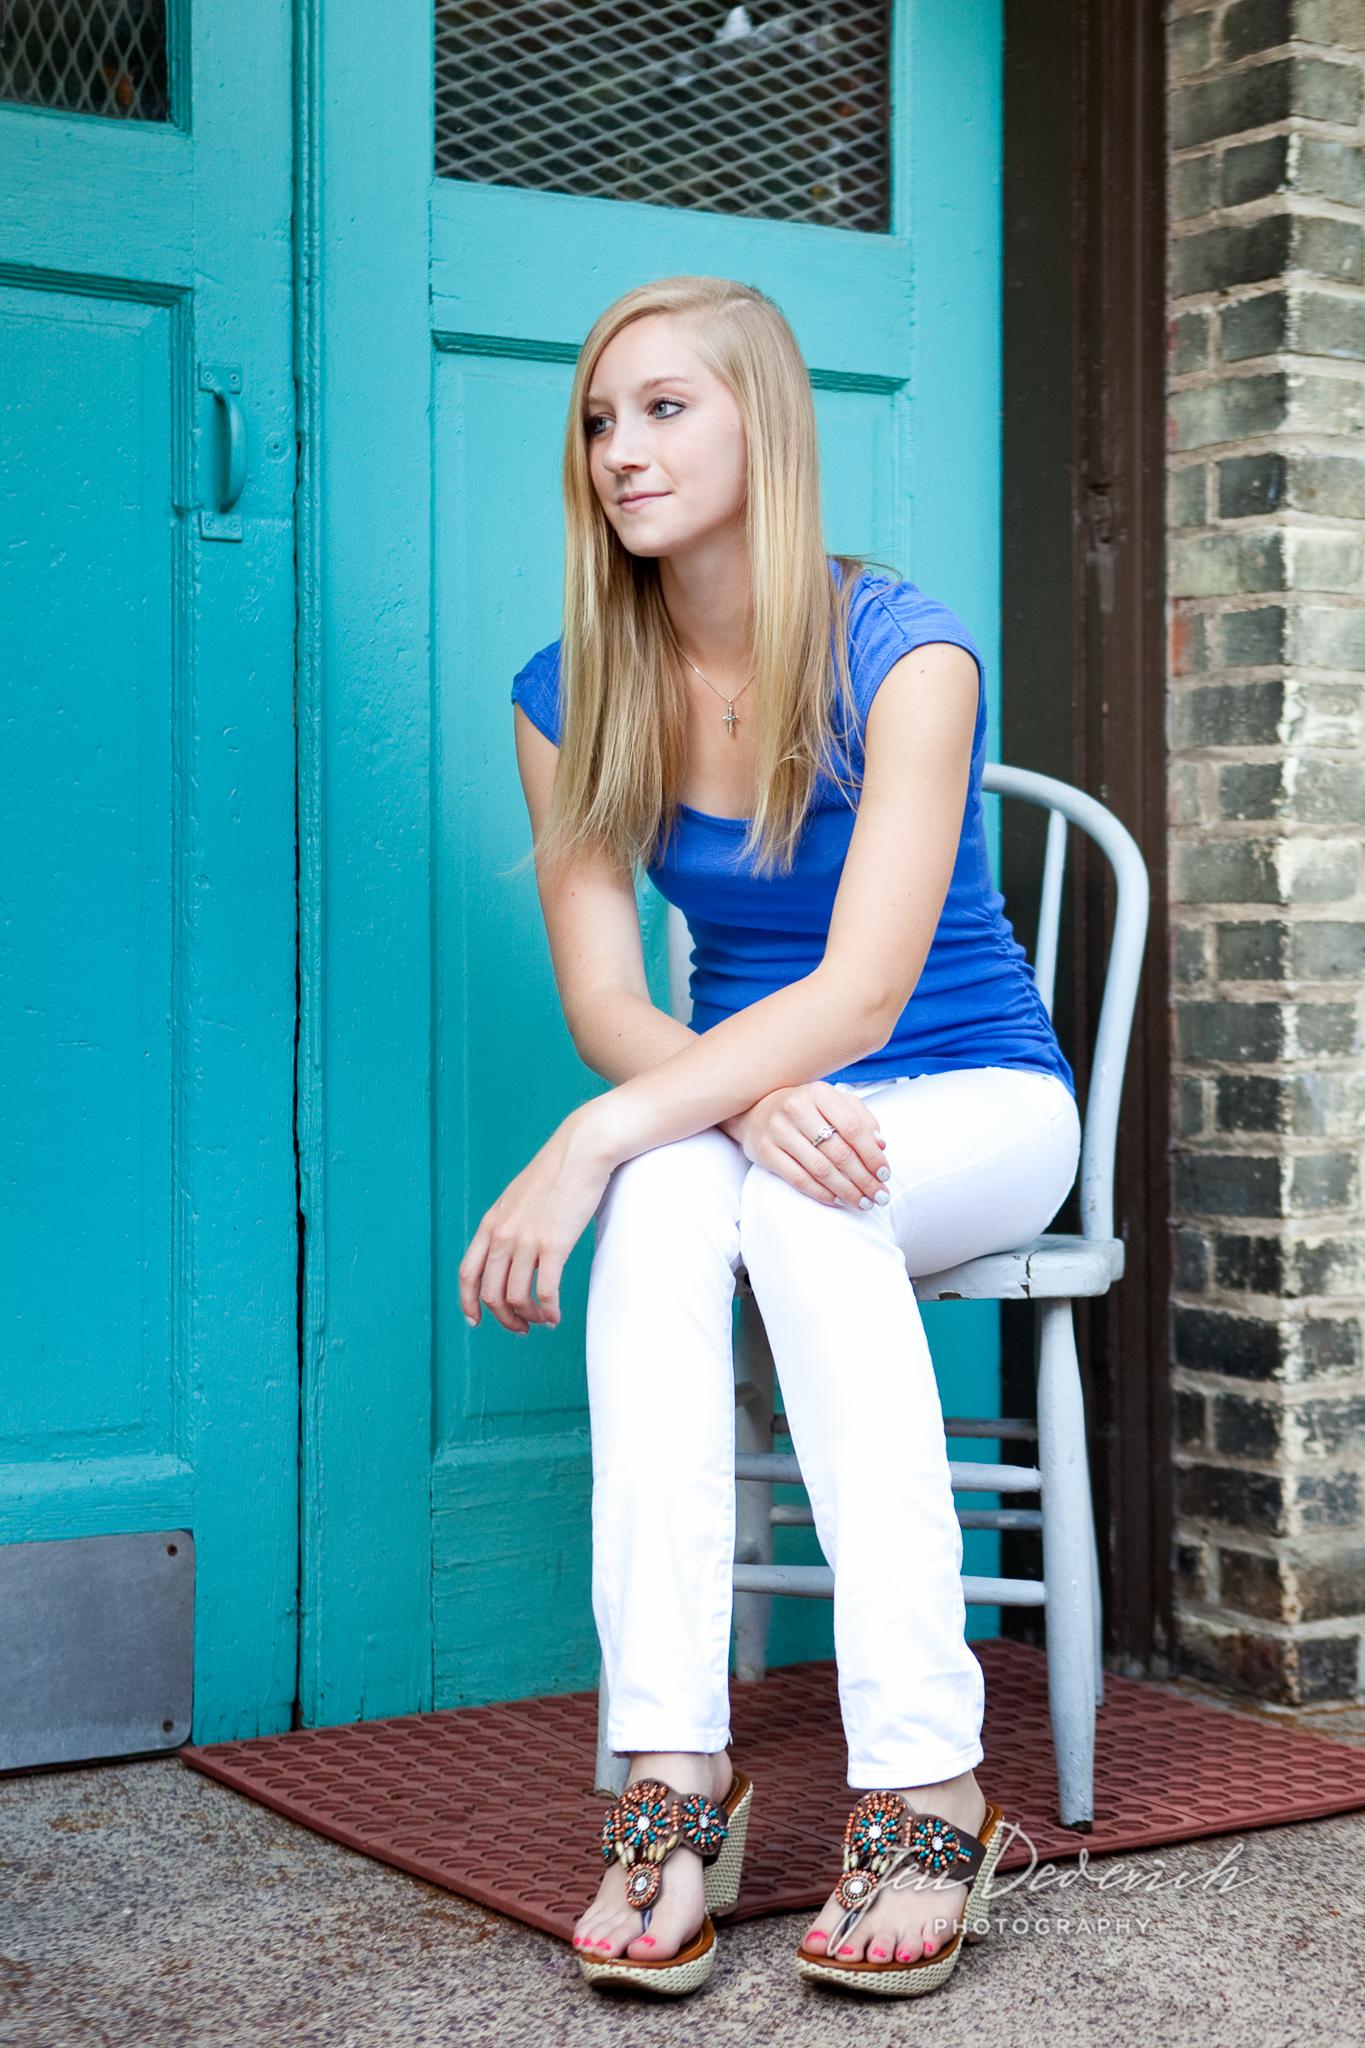 Senior_Madison WI_Jen Dederich Photography_015.jpg